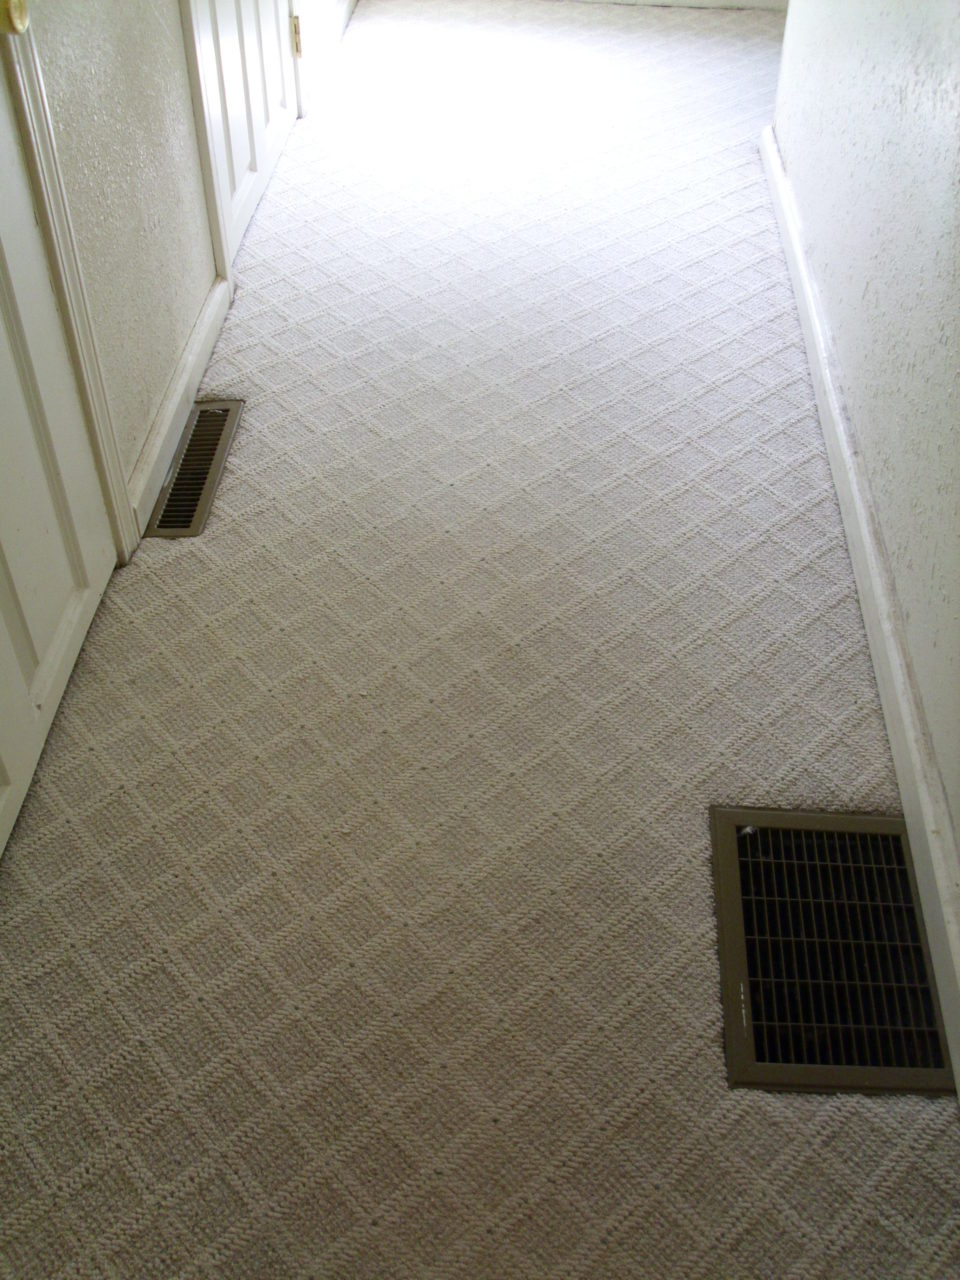 Same hallway Before & after photos